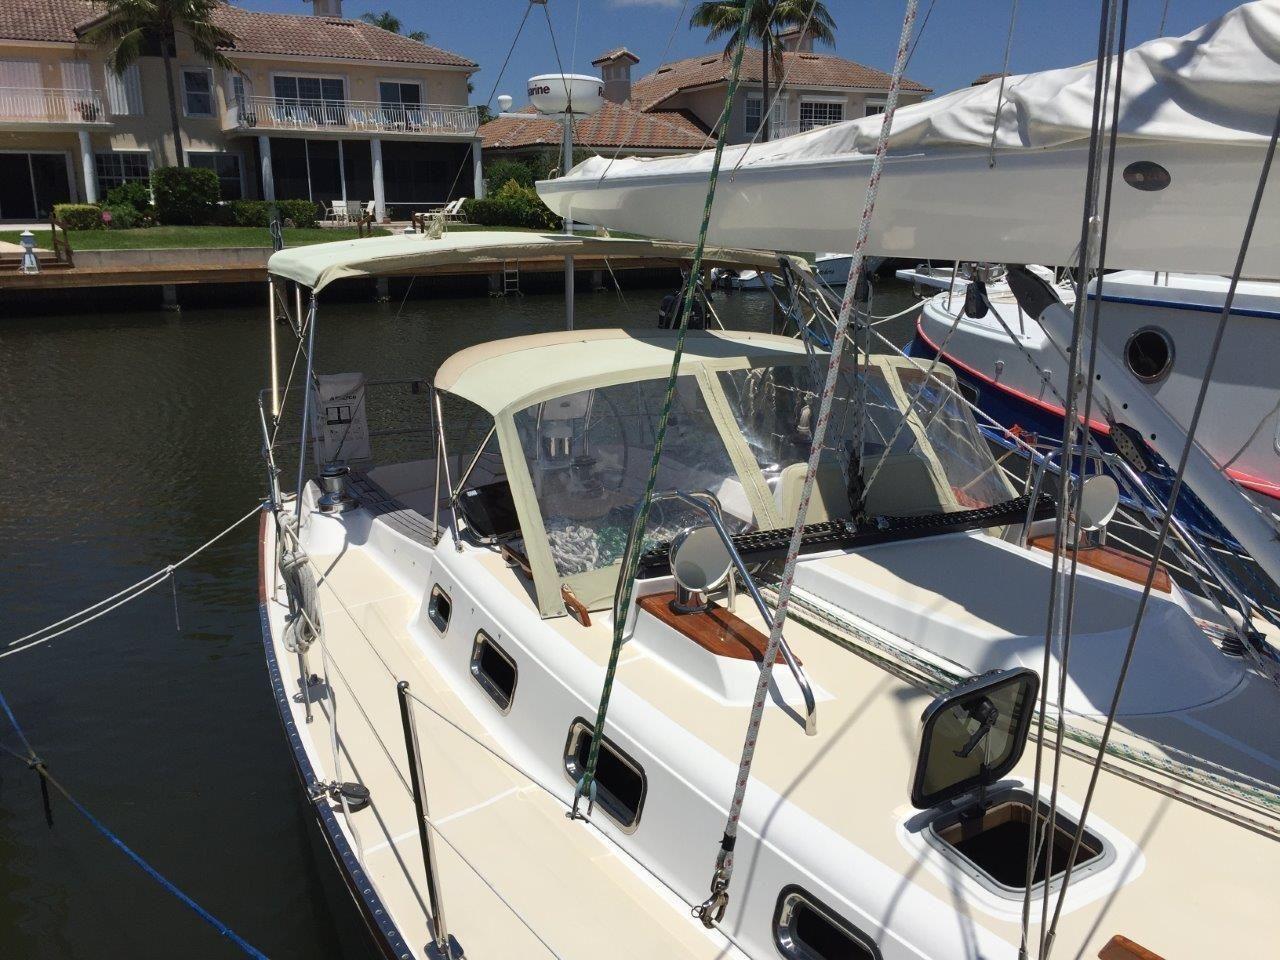 2008 Used Tartan 3700 CCR Cruiser Sailboat For Sale